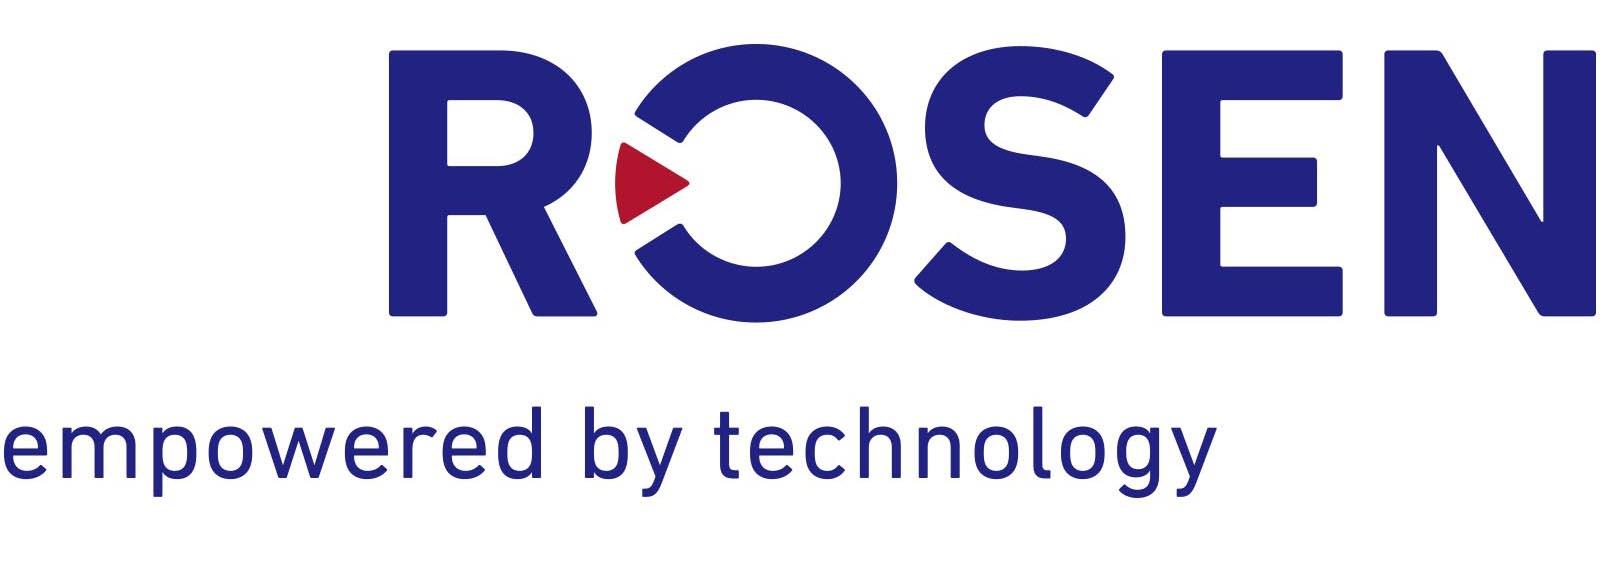 ROSEN_Logo_with_Claim